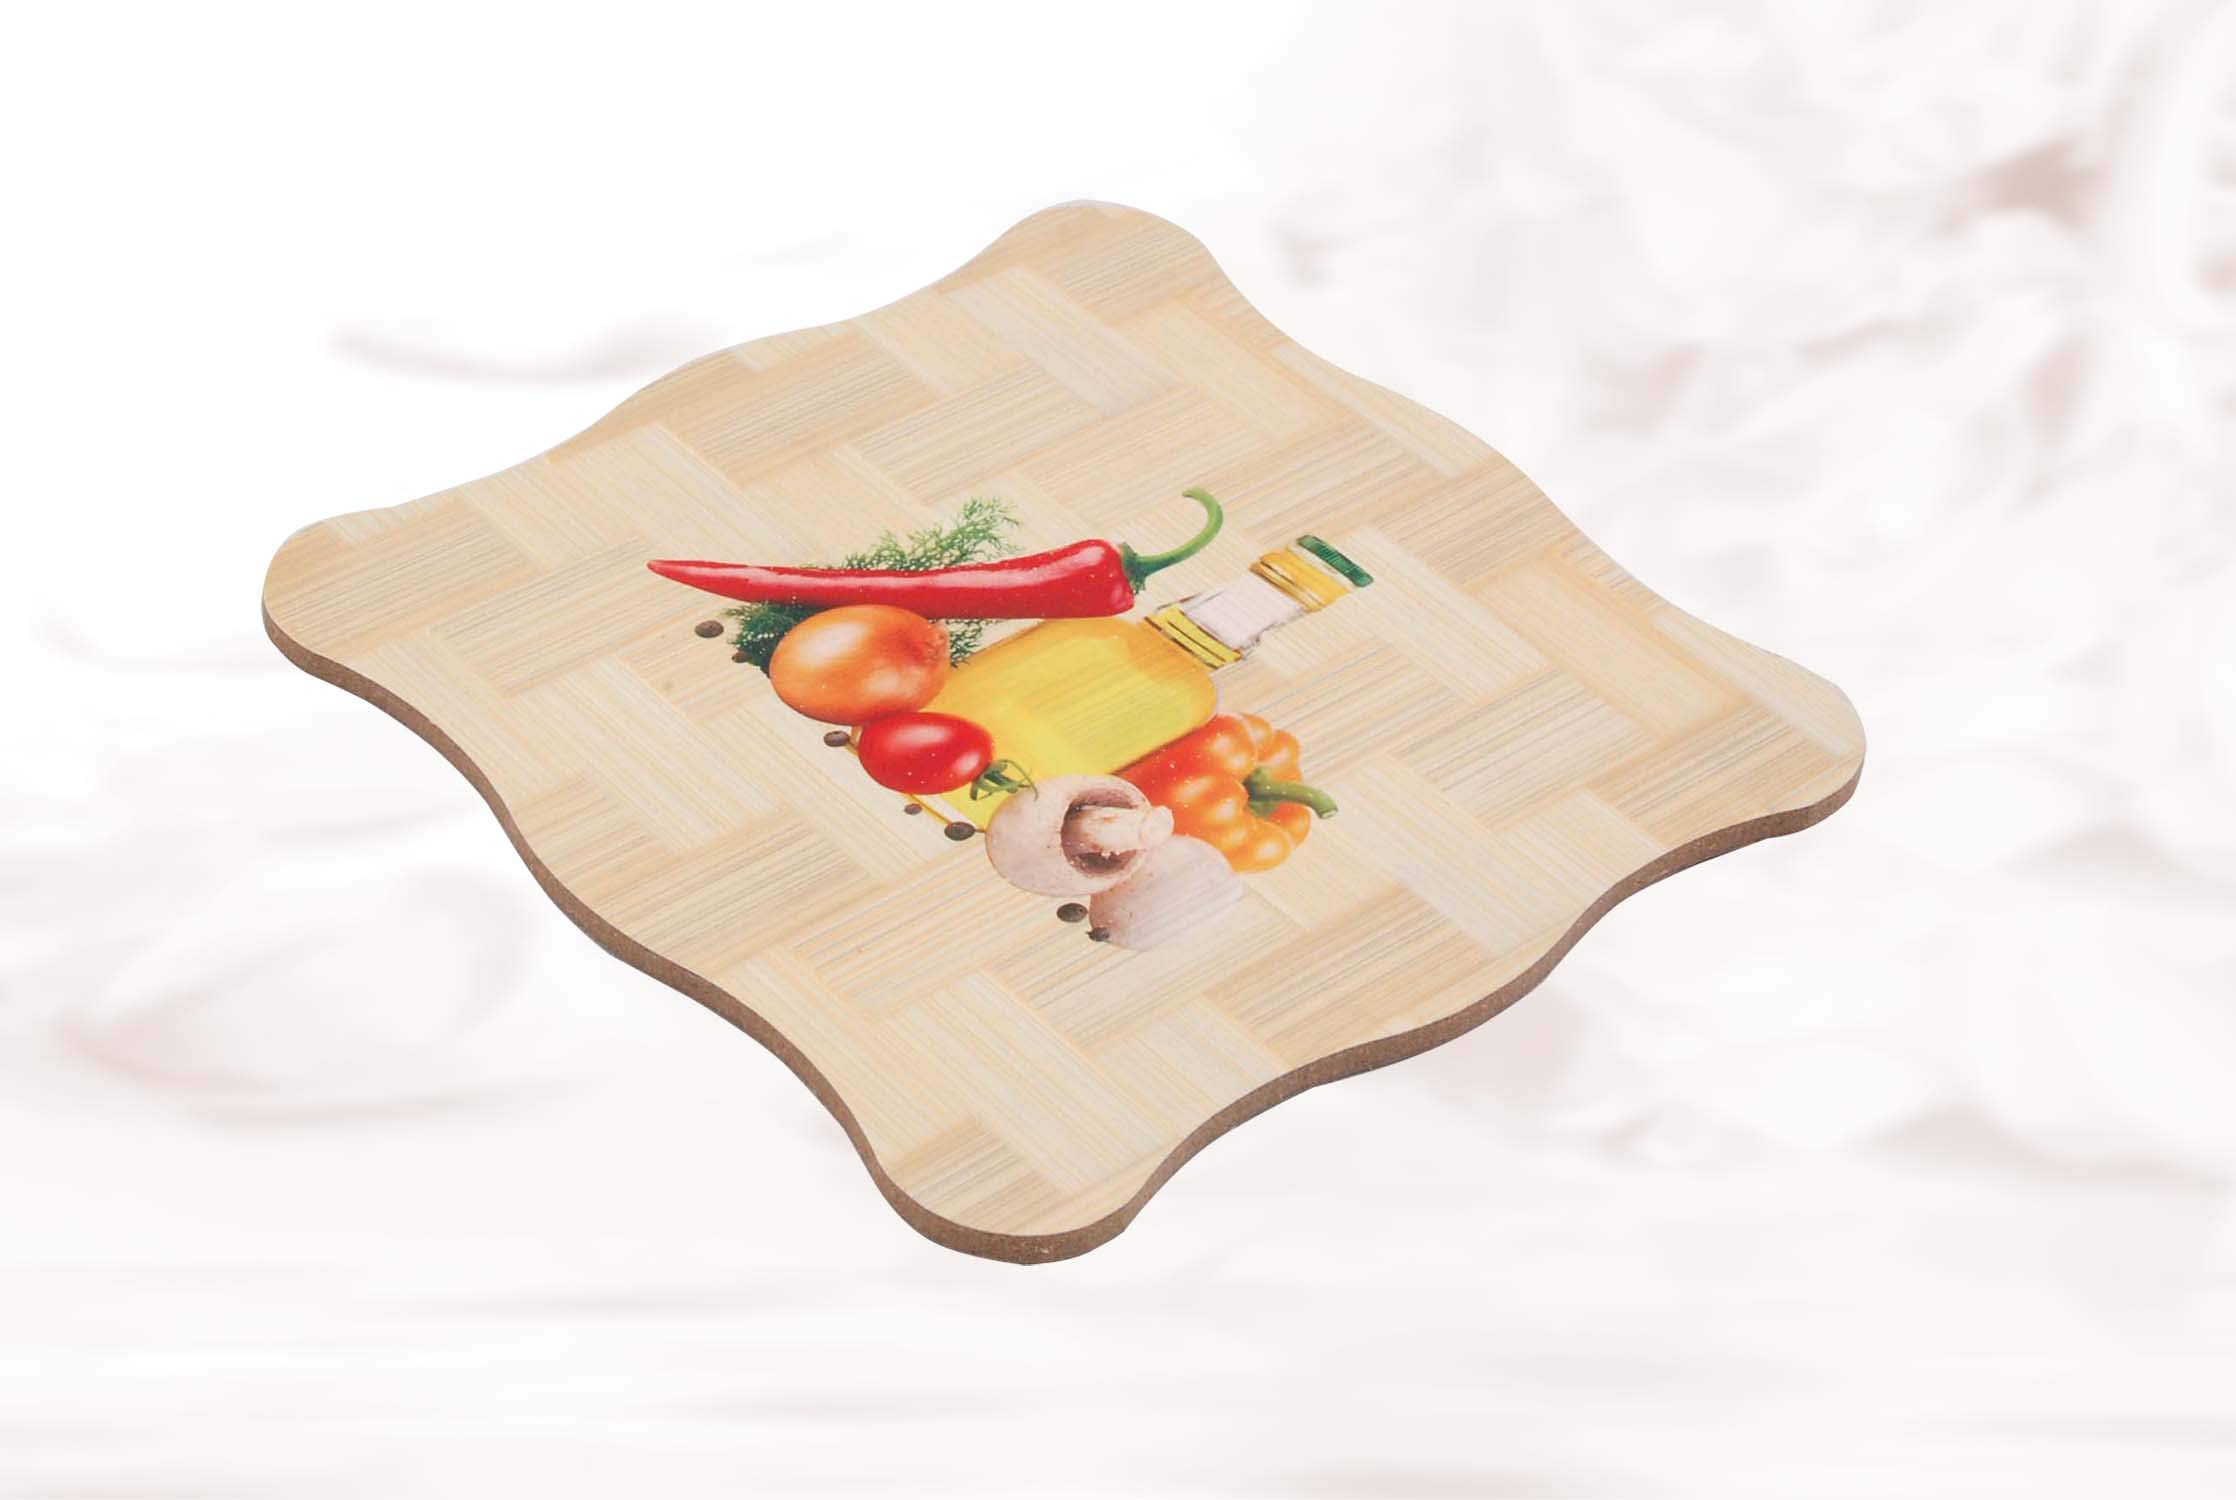 Krishna Handmade INDIAN Ethnic Wooden Dining Table HEAT PAD - 1 No/Home & Kitchen Product/Hot Tea Pot & Kettle Pad/Heat Insulation Kitchen Accessories/Wood Trivet 6'' Sq - 5mm thk/[Krish-Misc-A105]